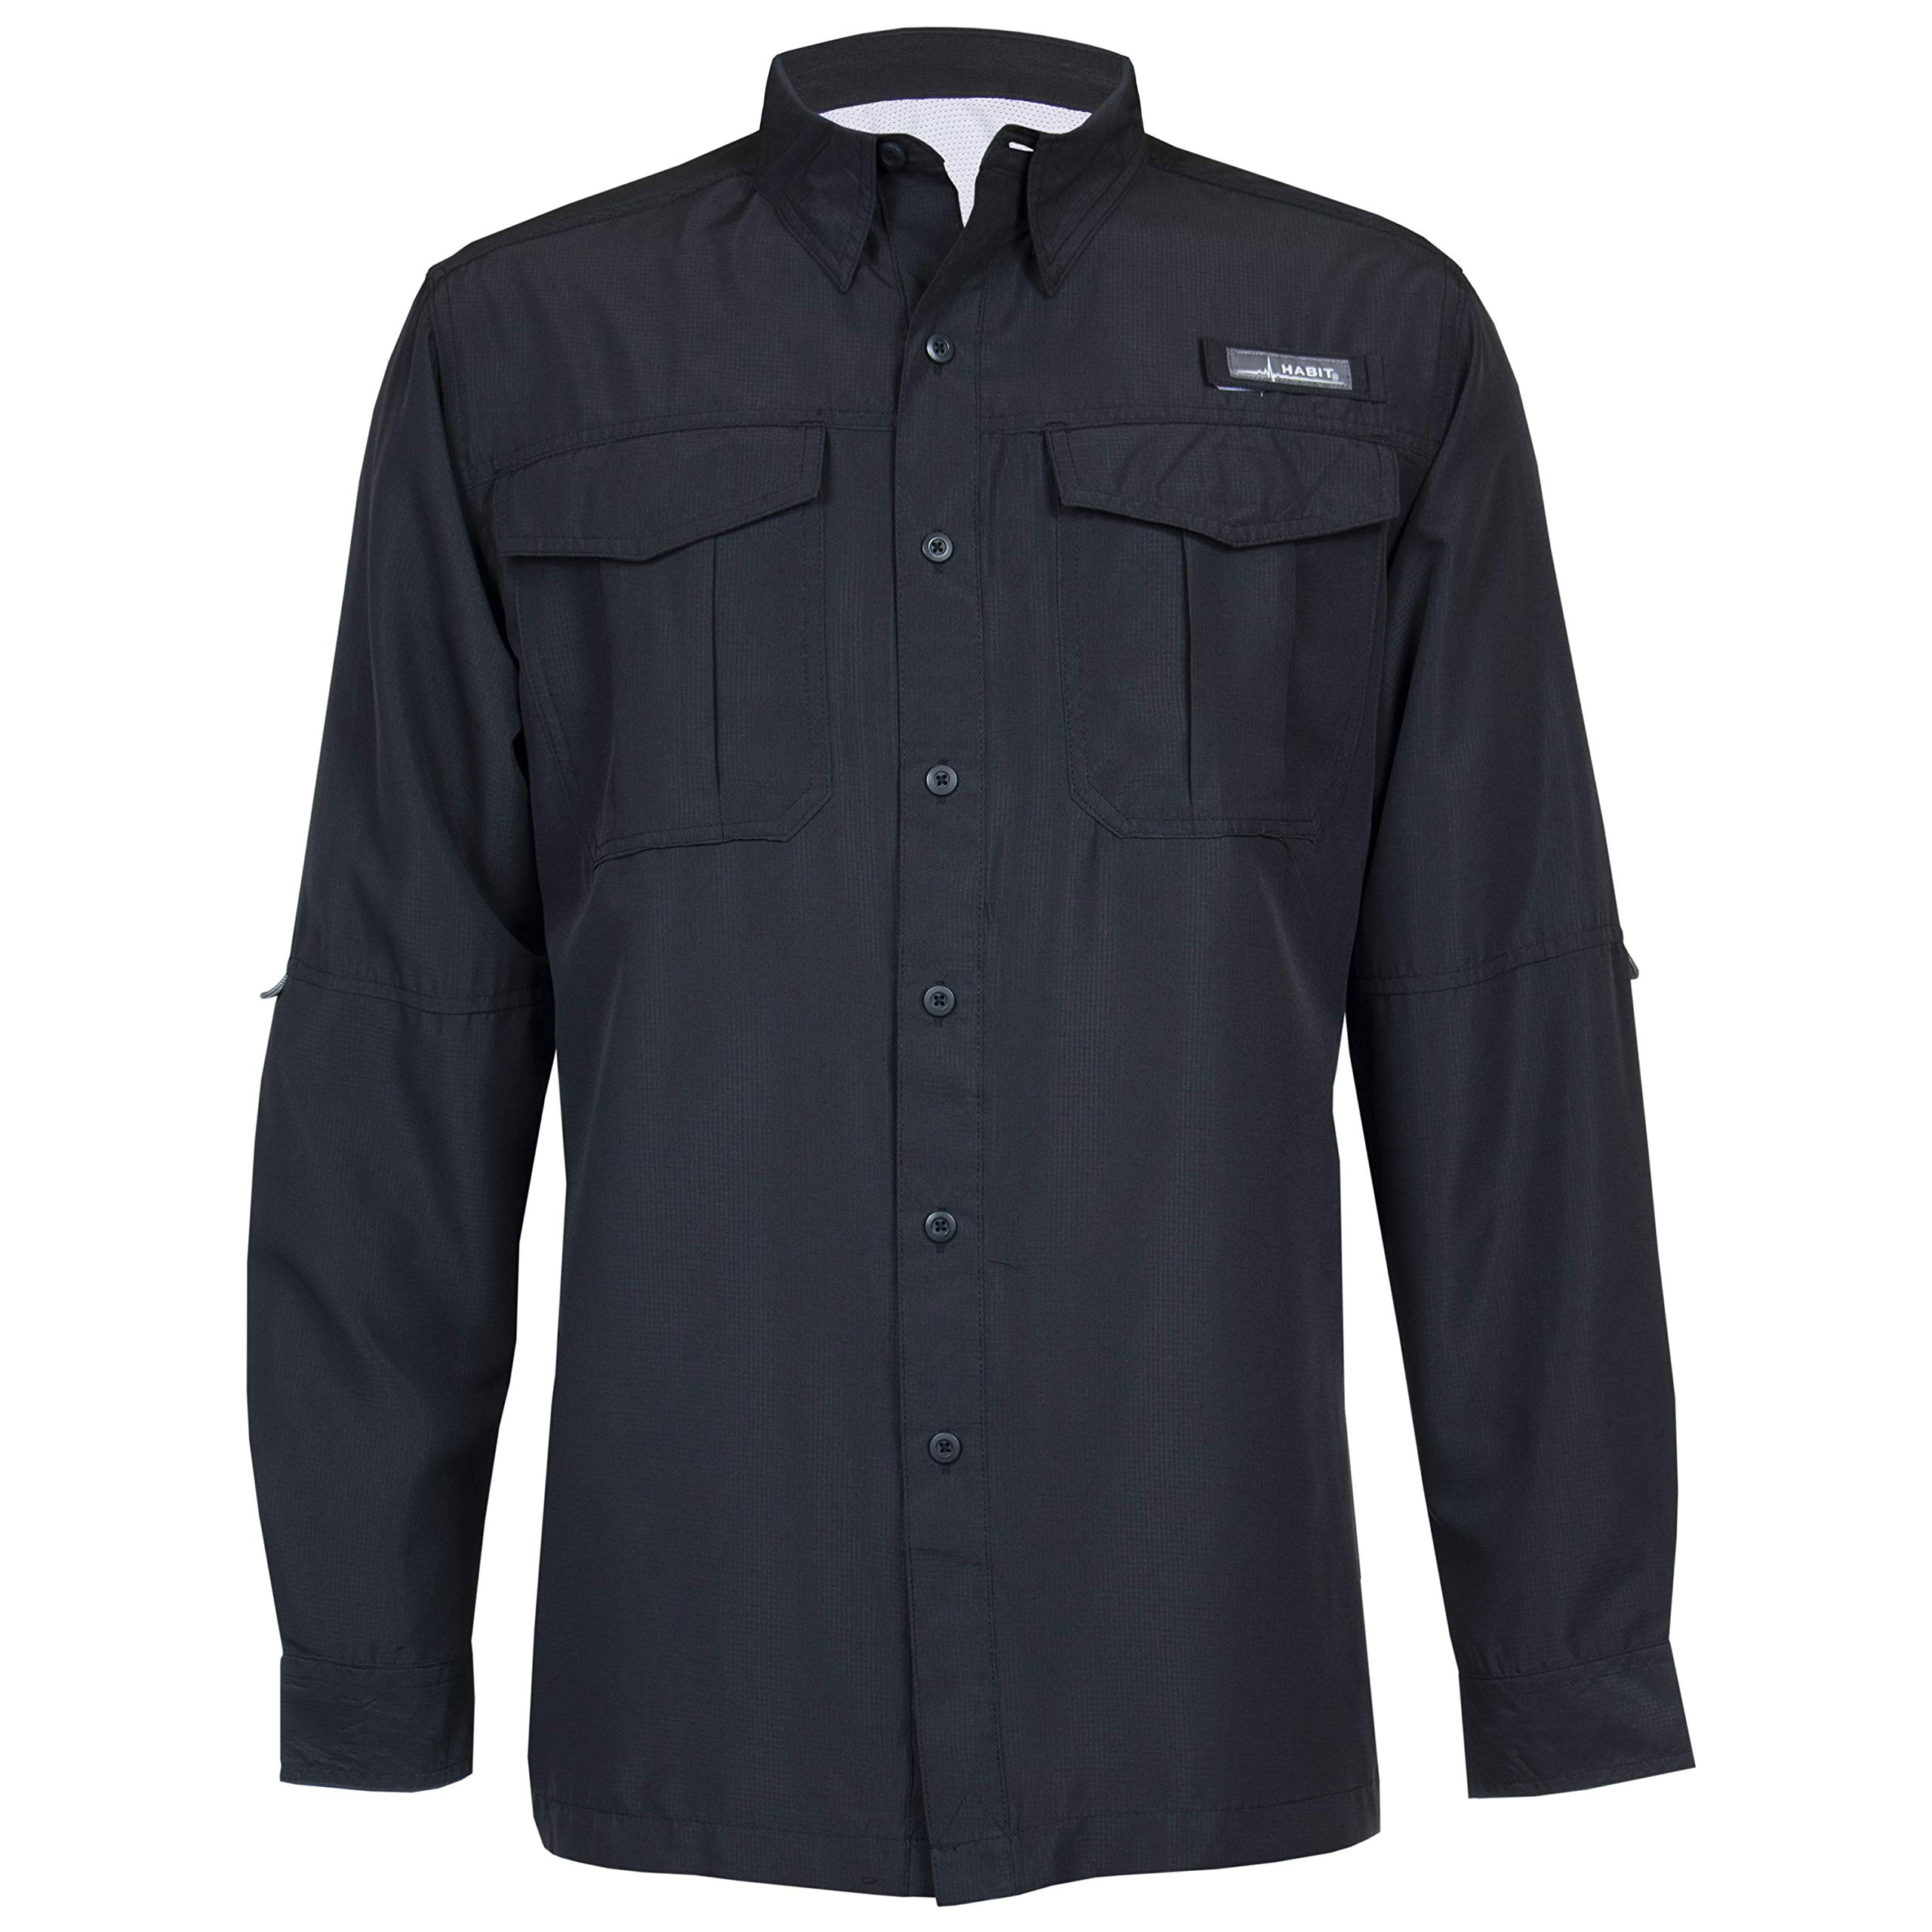 HABIT Men's Belcoast Long Sleeve River Guide Fishing Shirt, Black, 2X-Large